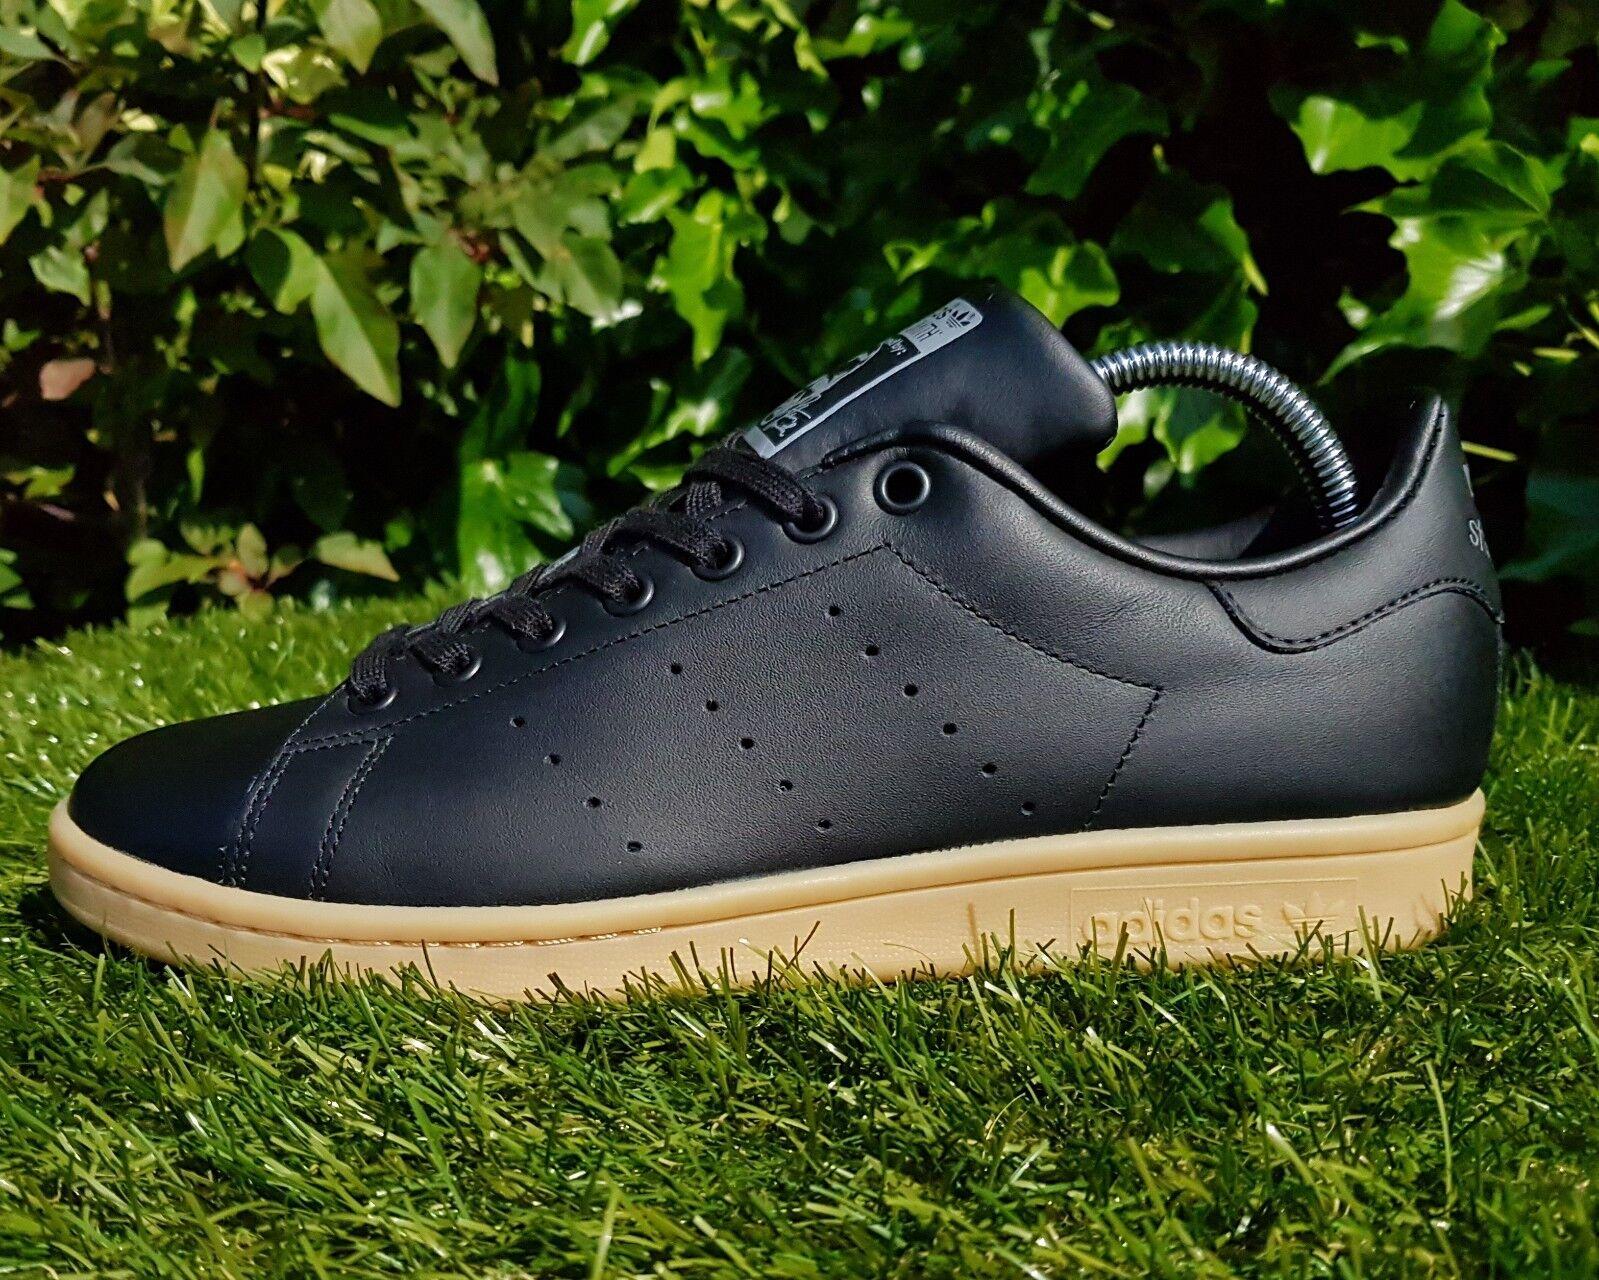 BNWB & Genuine adidas originals Stan Smith ® Black Leather Trainers UK Size 6